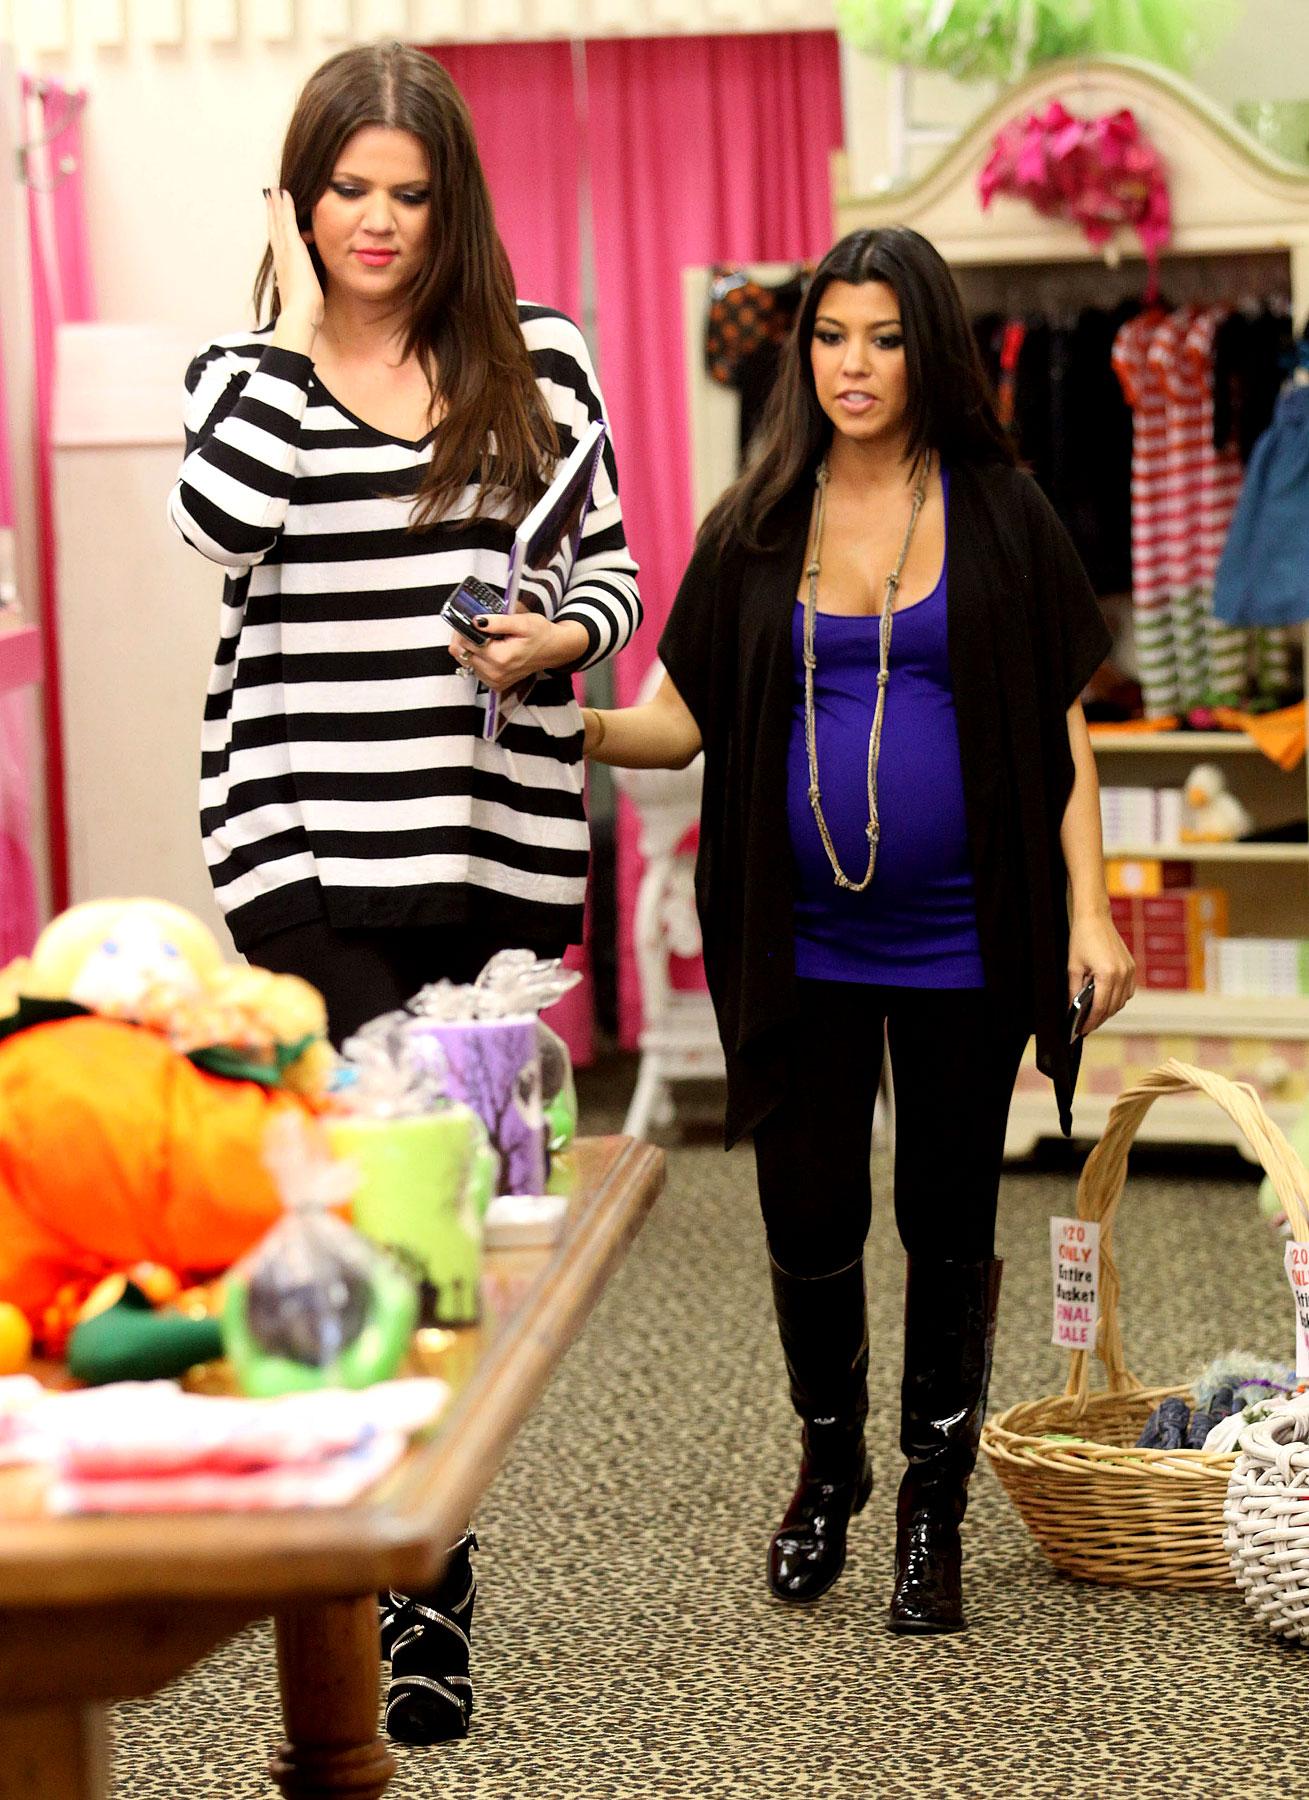 PHOTO GALLERY: Khloe & Kourtney Keep Shop